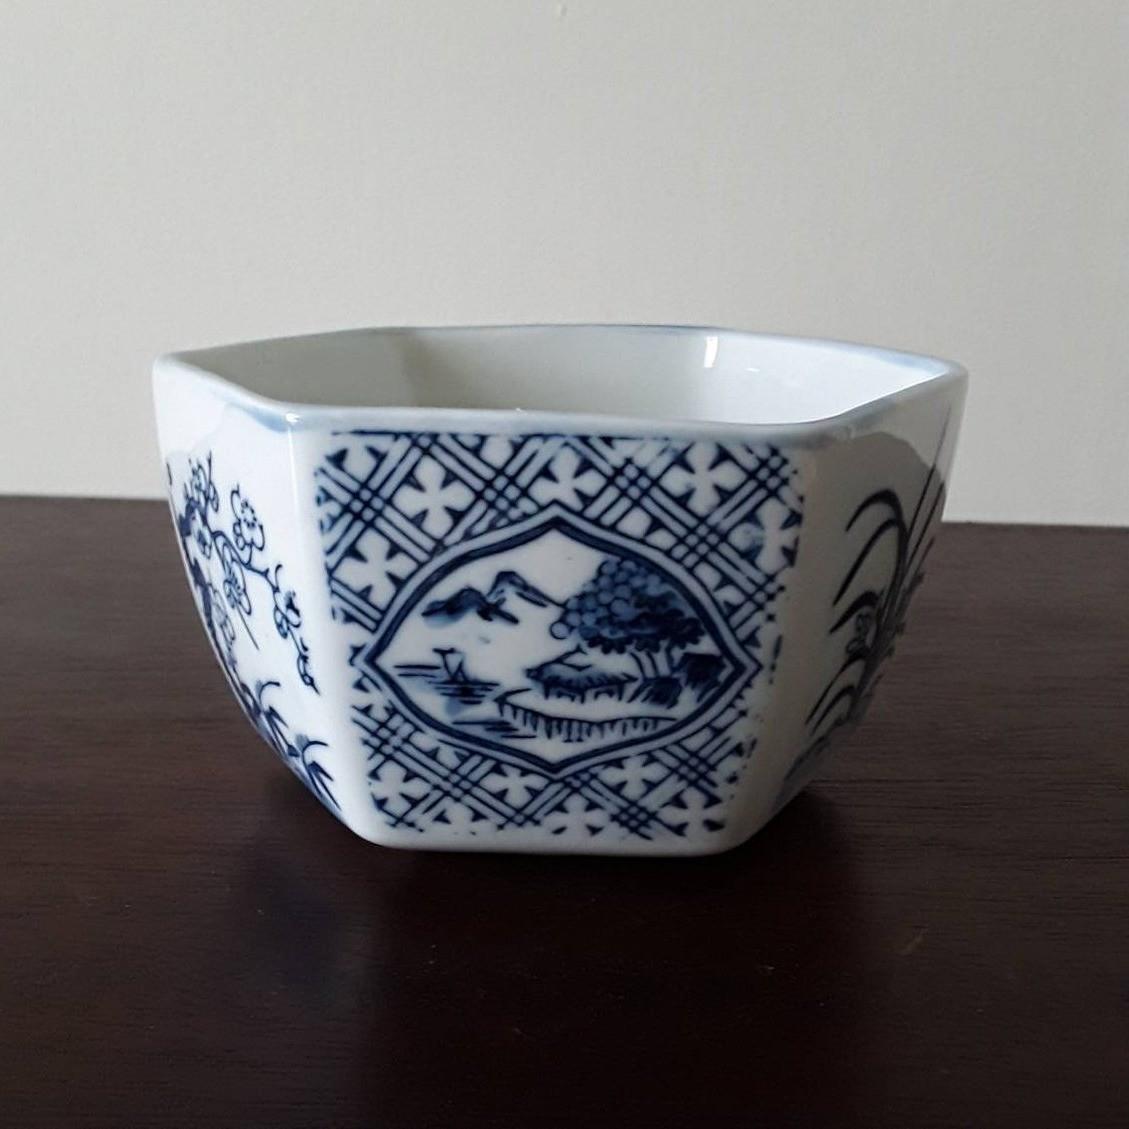 Vintage Blue and White Porcelain Hexagonal Bowl